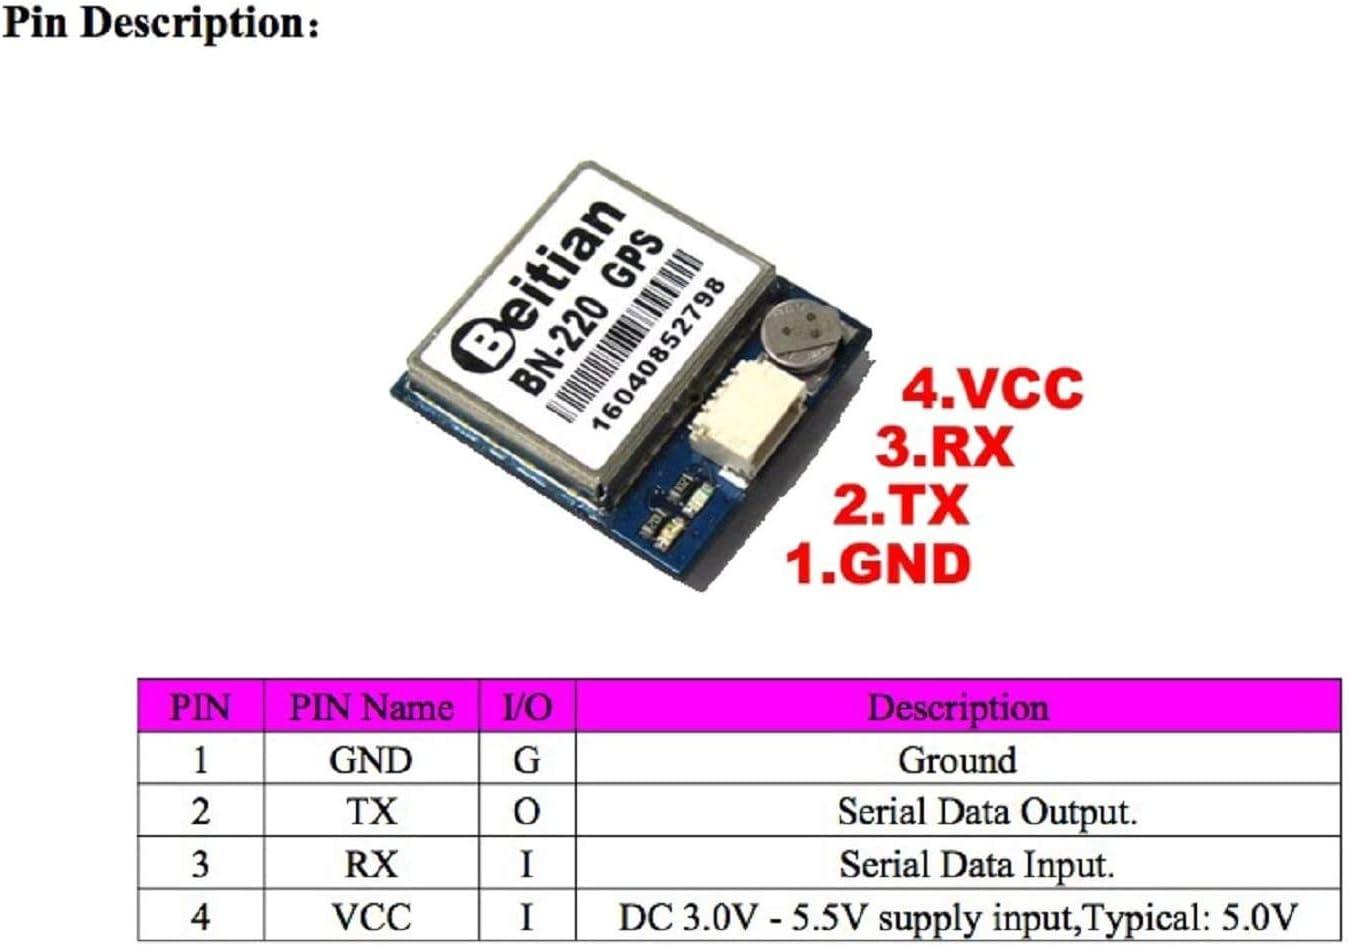 Beitian BN-220 Dual GPS Glonass Module Antenna Built-in LED Flash TTL Level 9600bps 4M Passive Antenna for Arduino Raspberry Pi Pixhawk F3 CC3D Betaflight F4 Flight SKlle